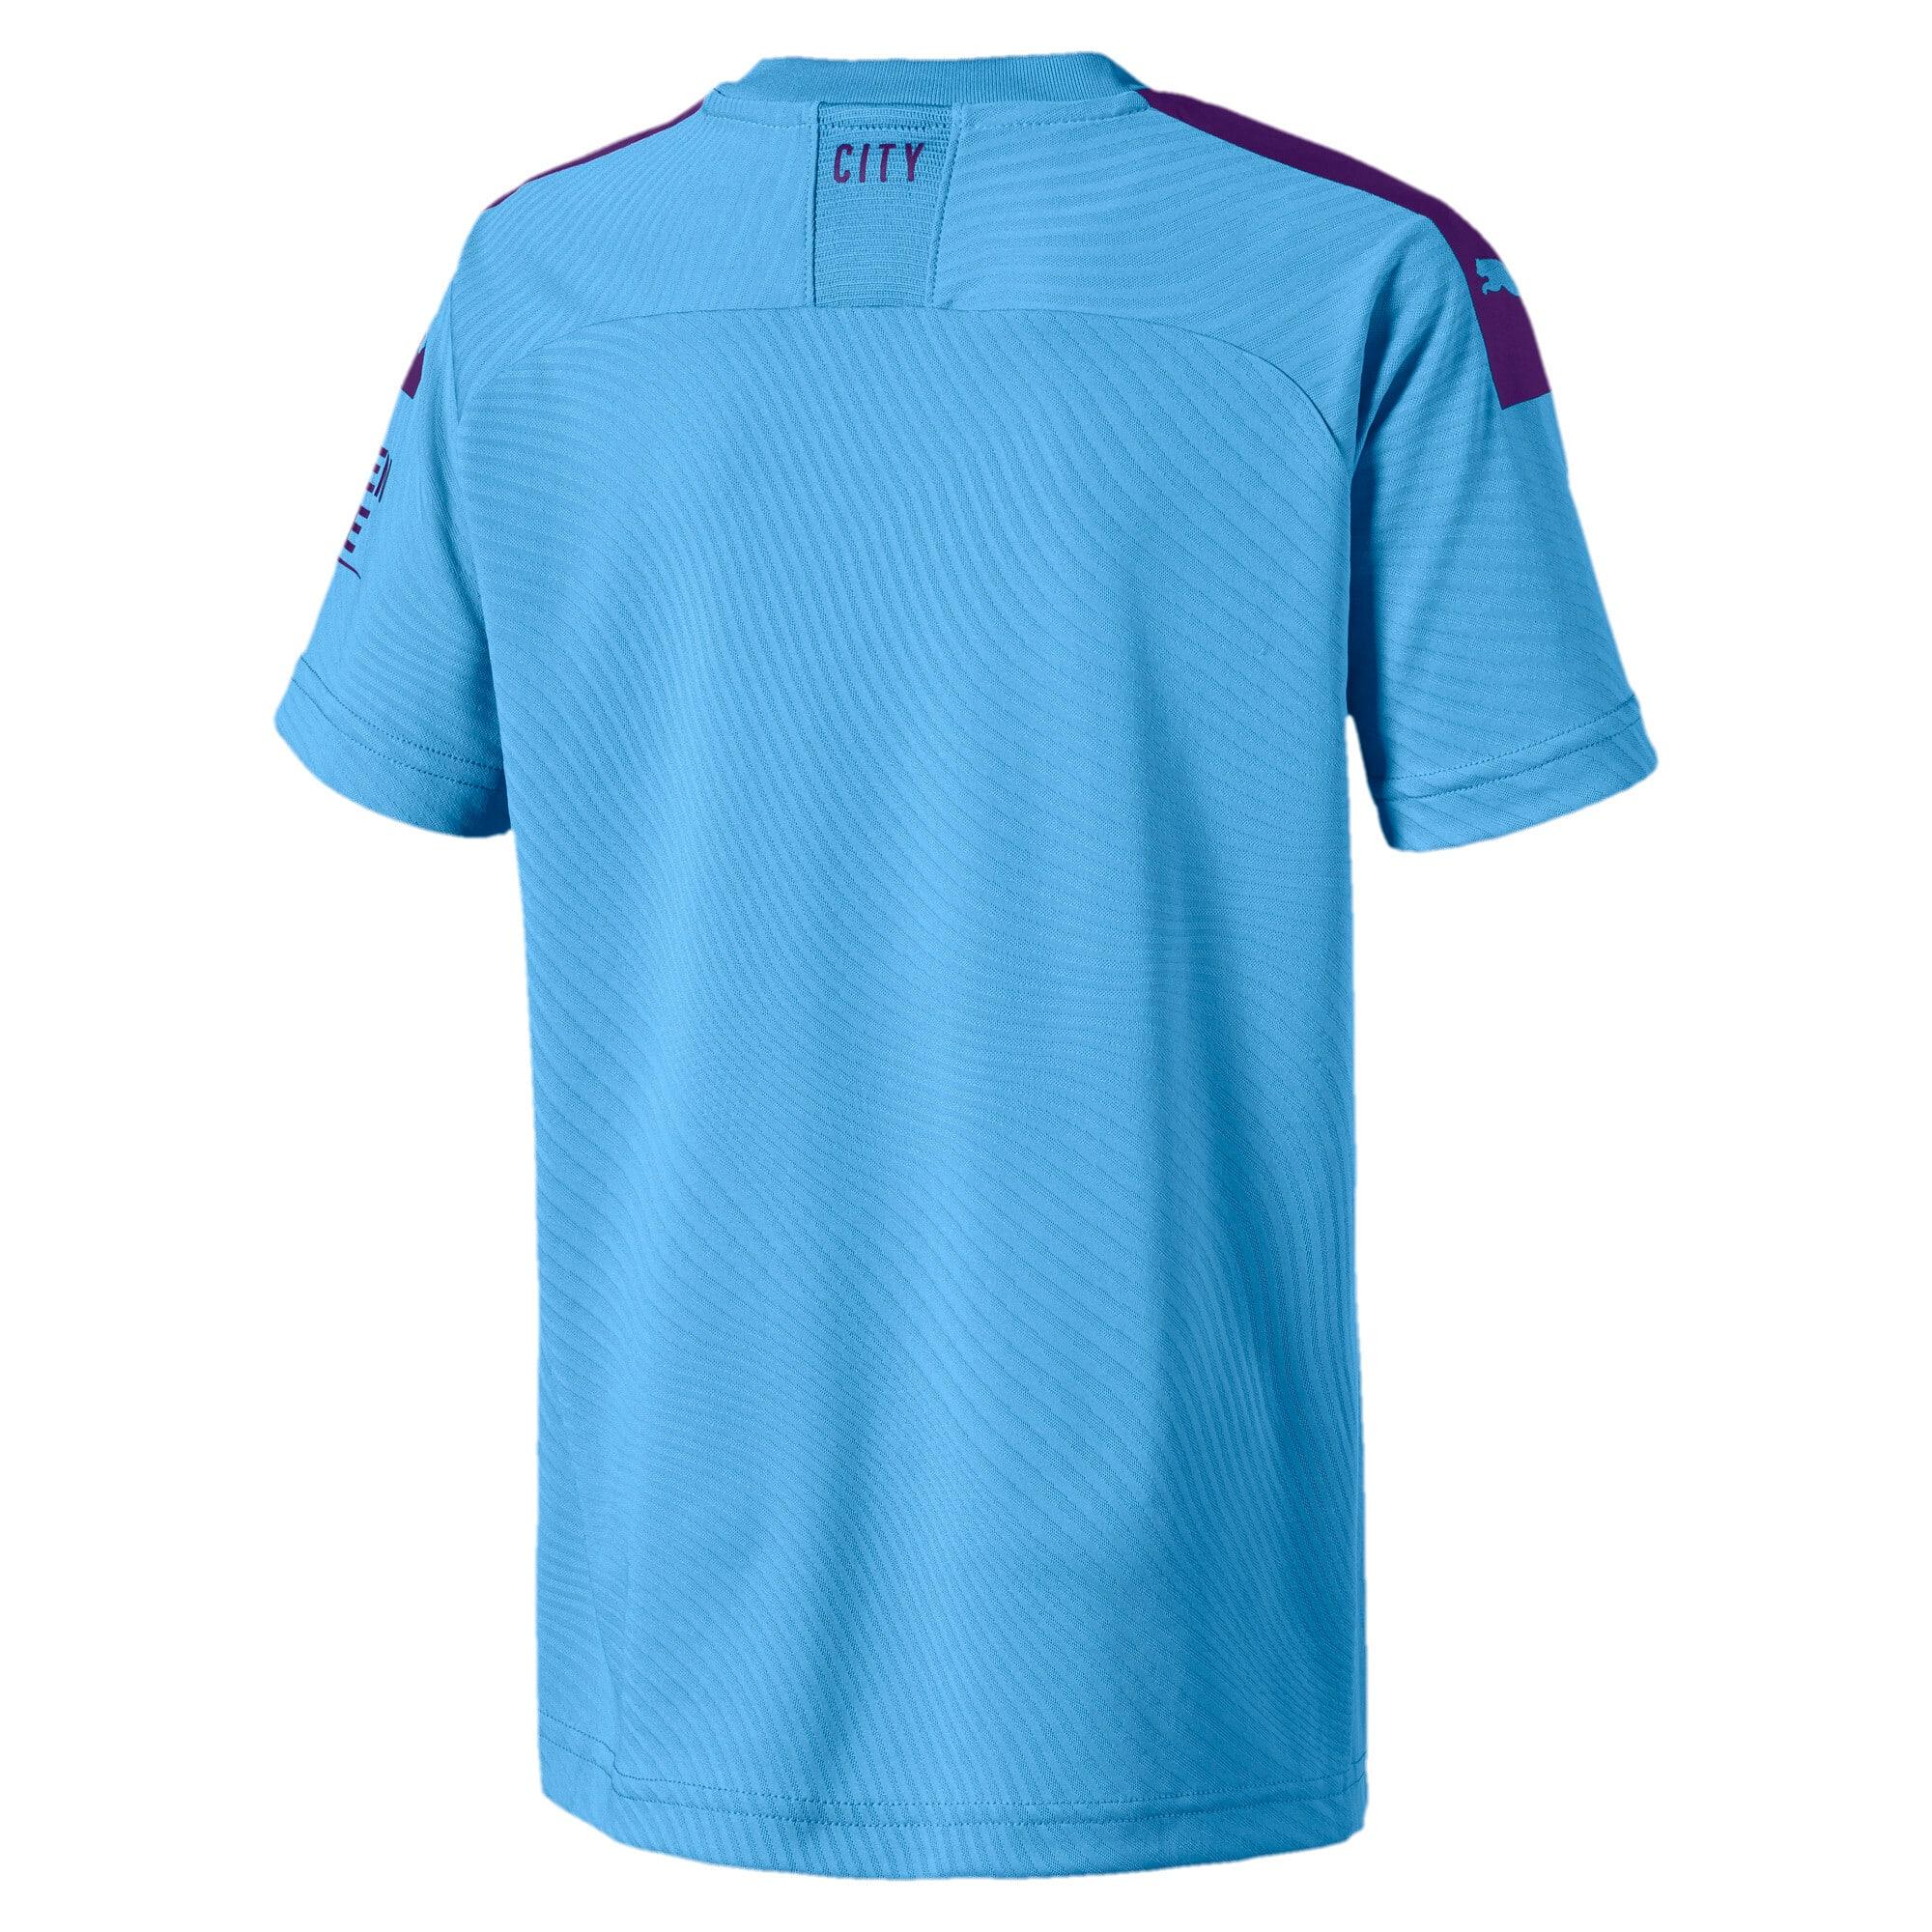 Thumbnail 3 of Man City Short Sleeve Kids' Home Replica Jersey, TeamLightBlue-TillandsiaPurp, medium-IND